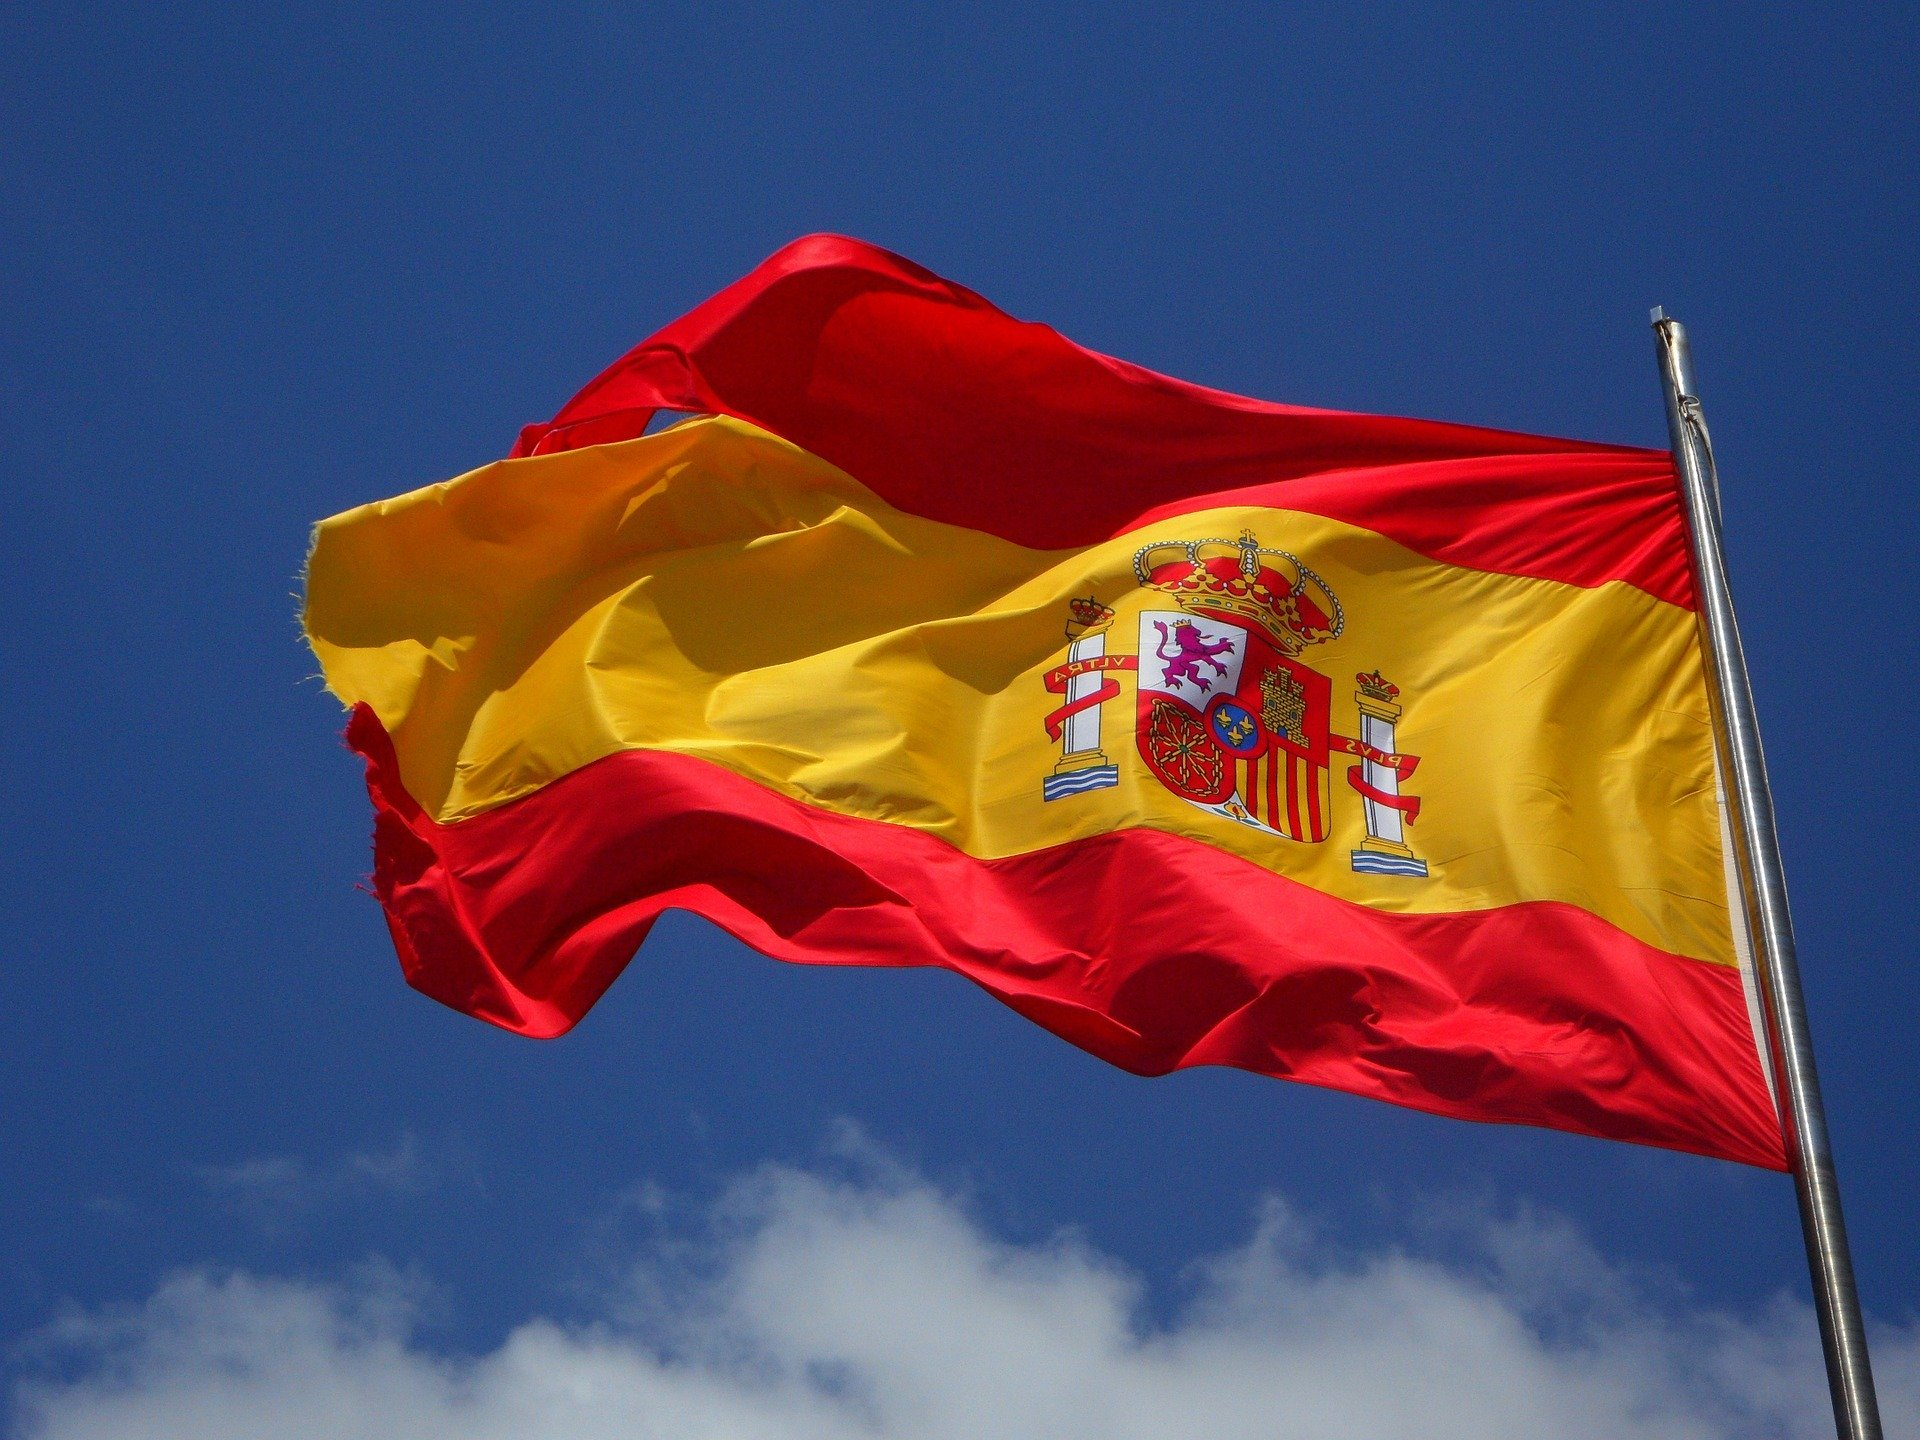 Jdigital Warns Of Black Market Revolt After Spanish Decree